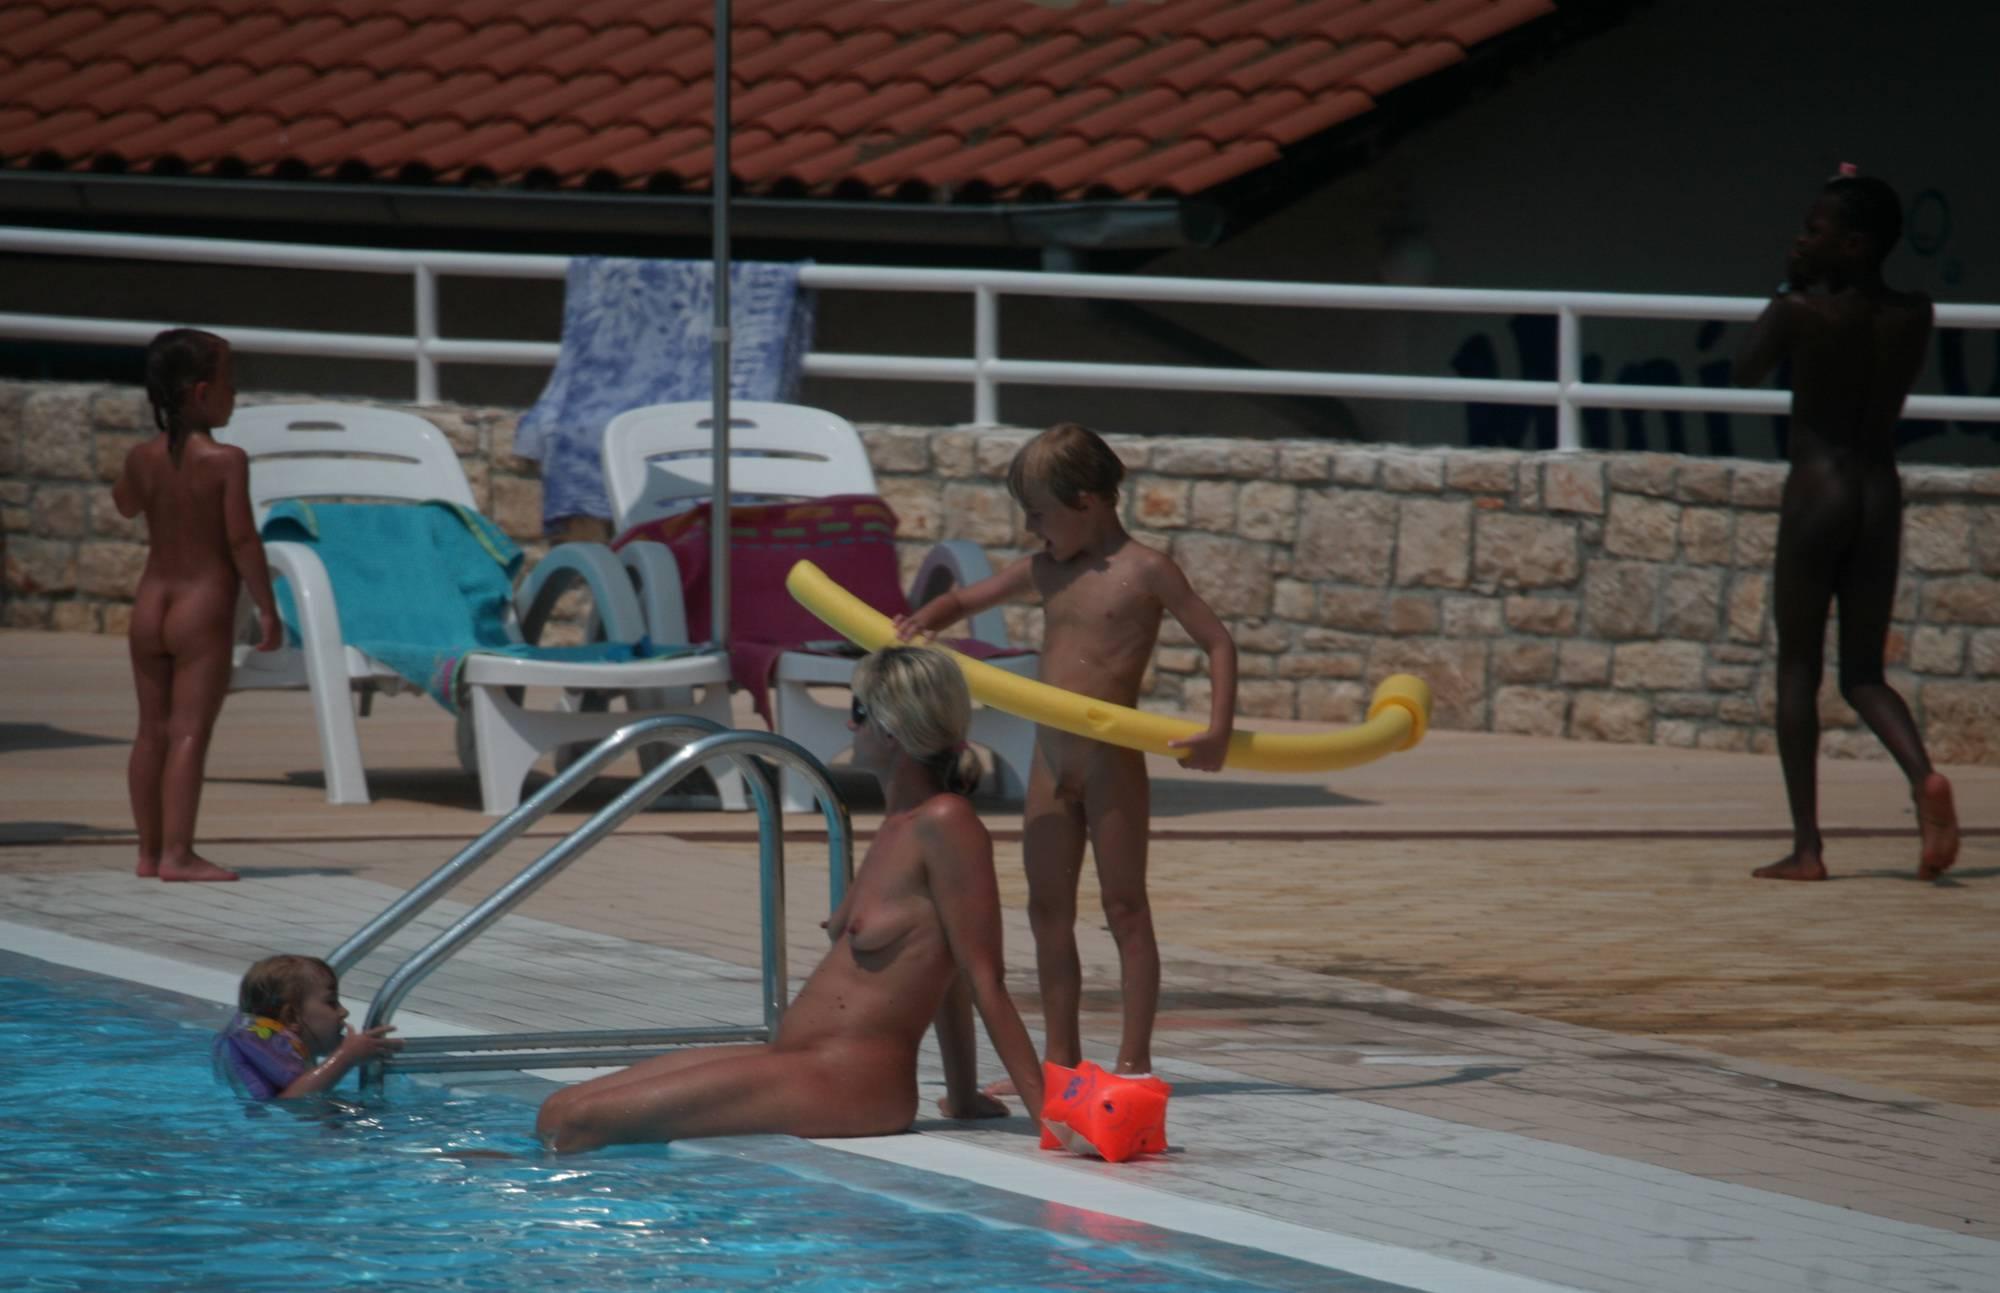 Naturist Poolside Families - 1